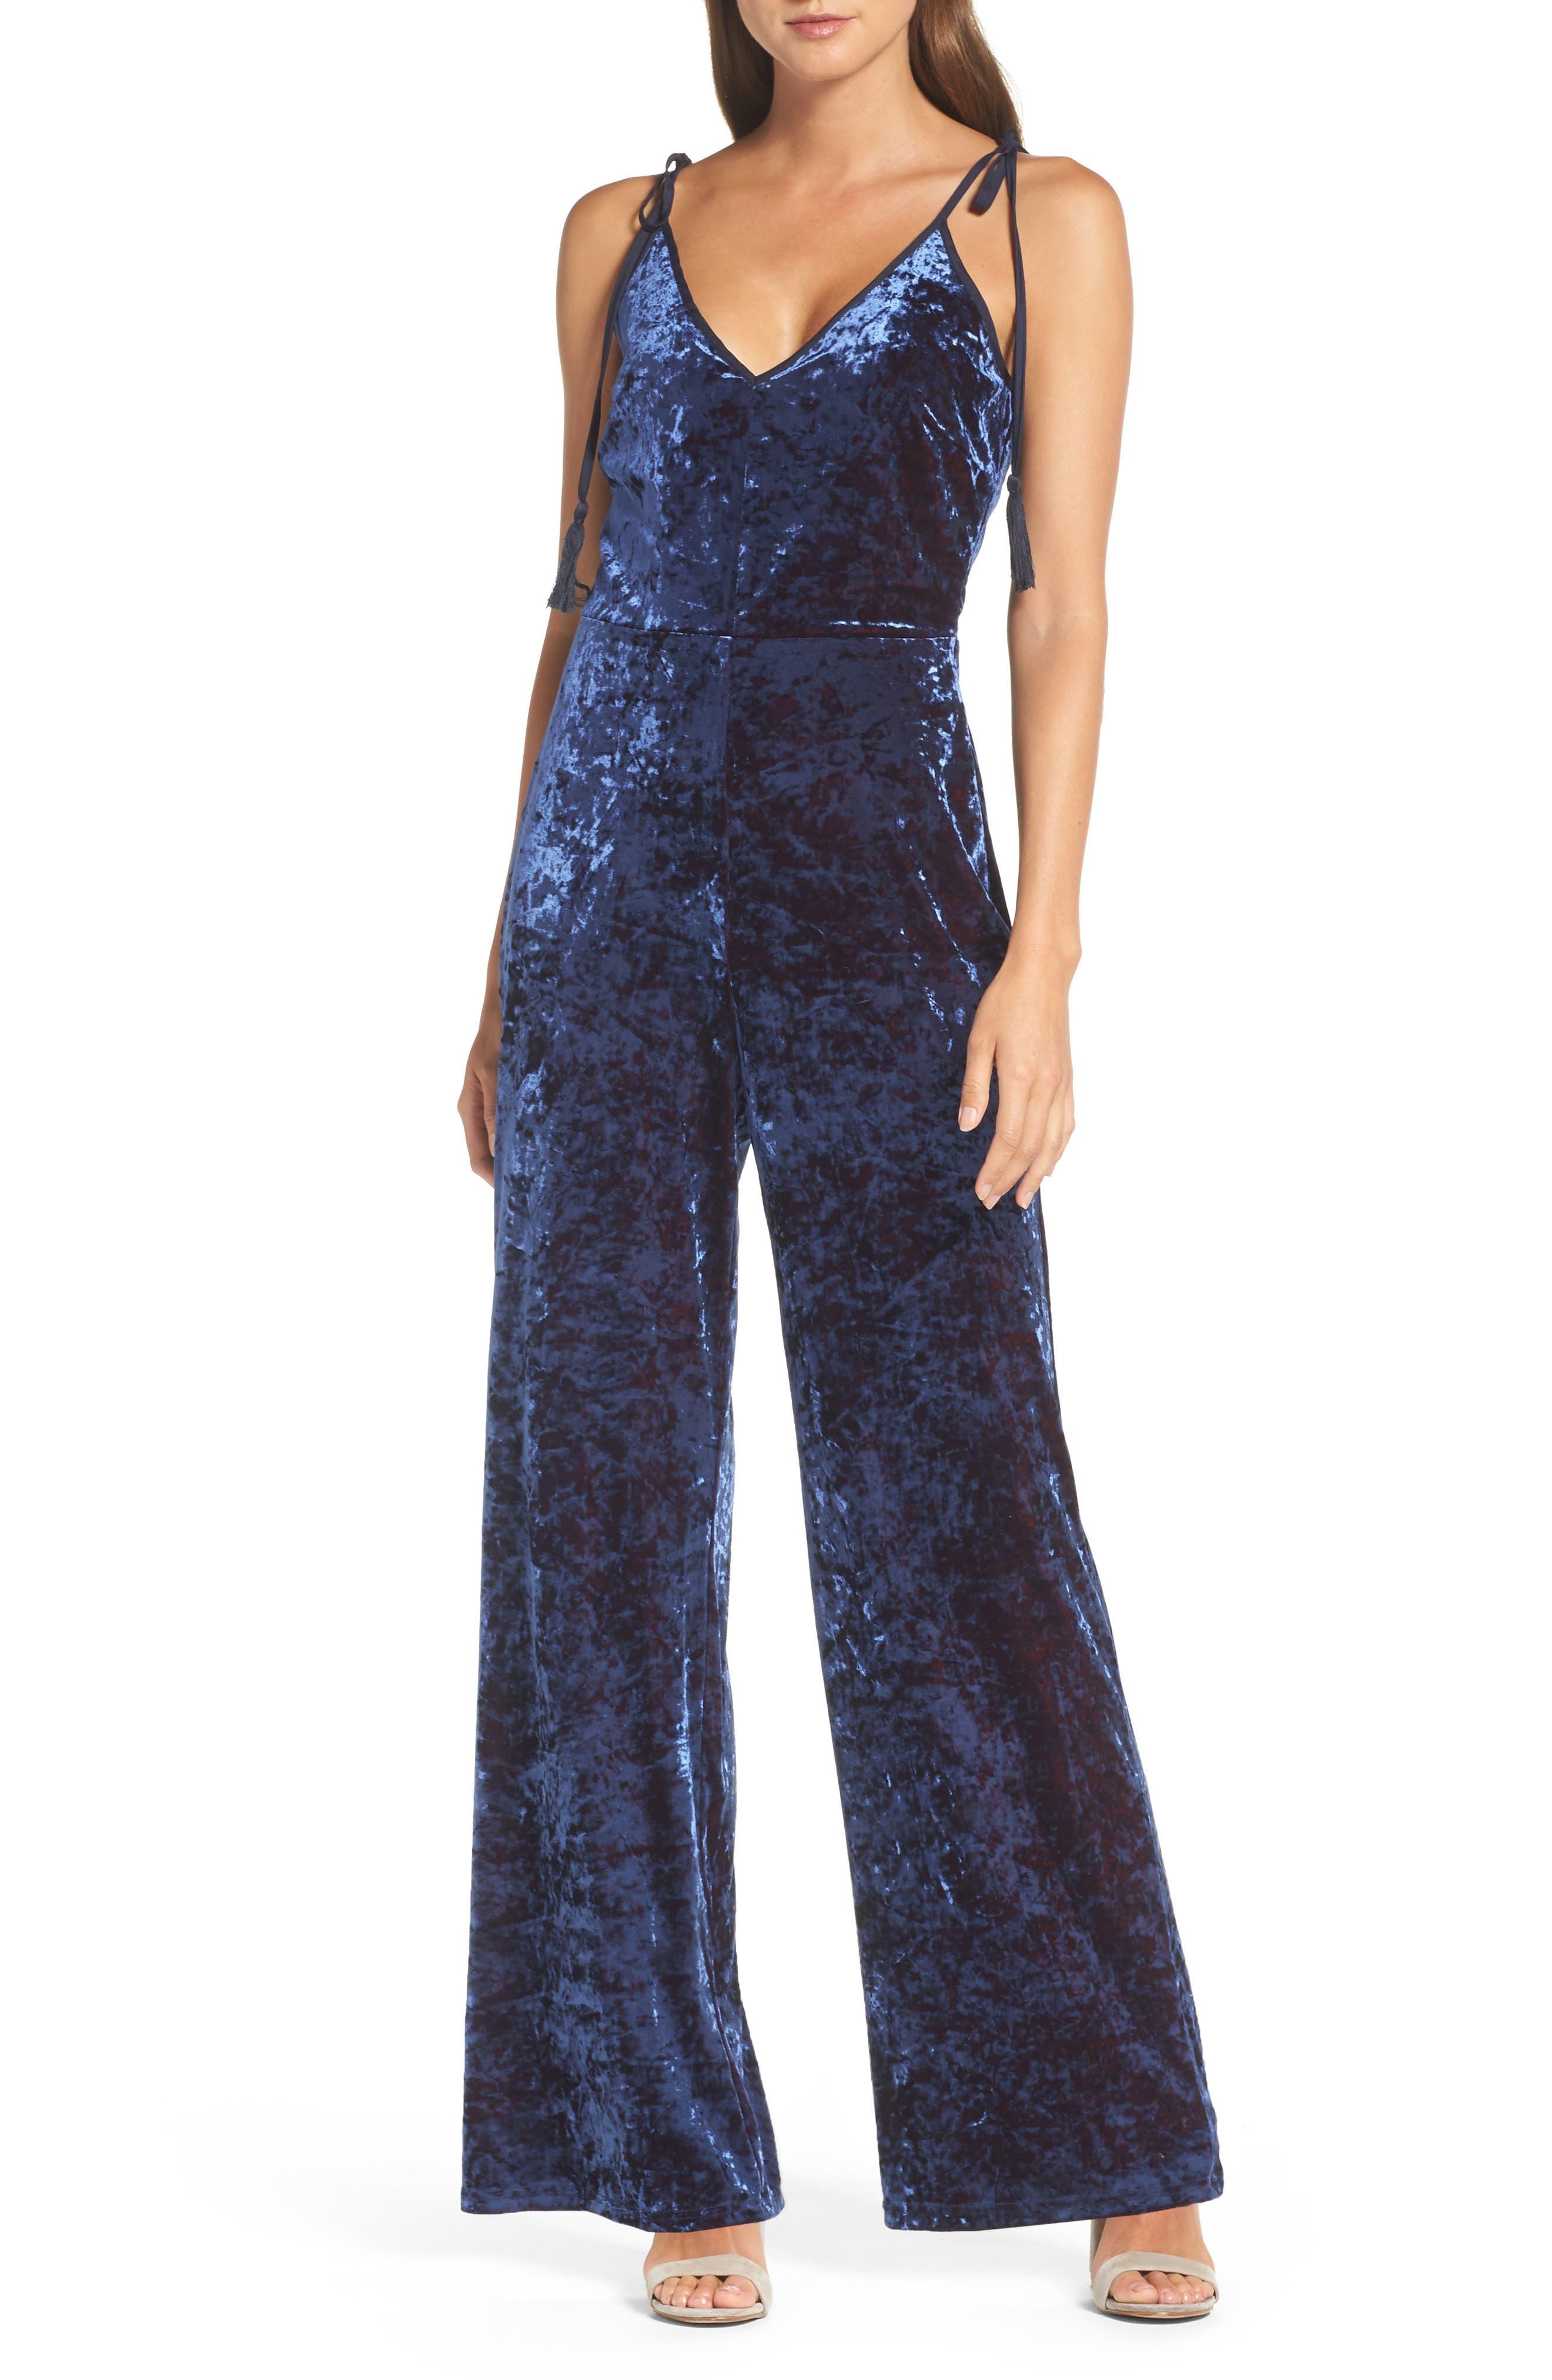 Regina Crushed Velvet Jumpsuit,                         Main,                         color, 410